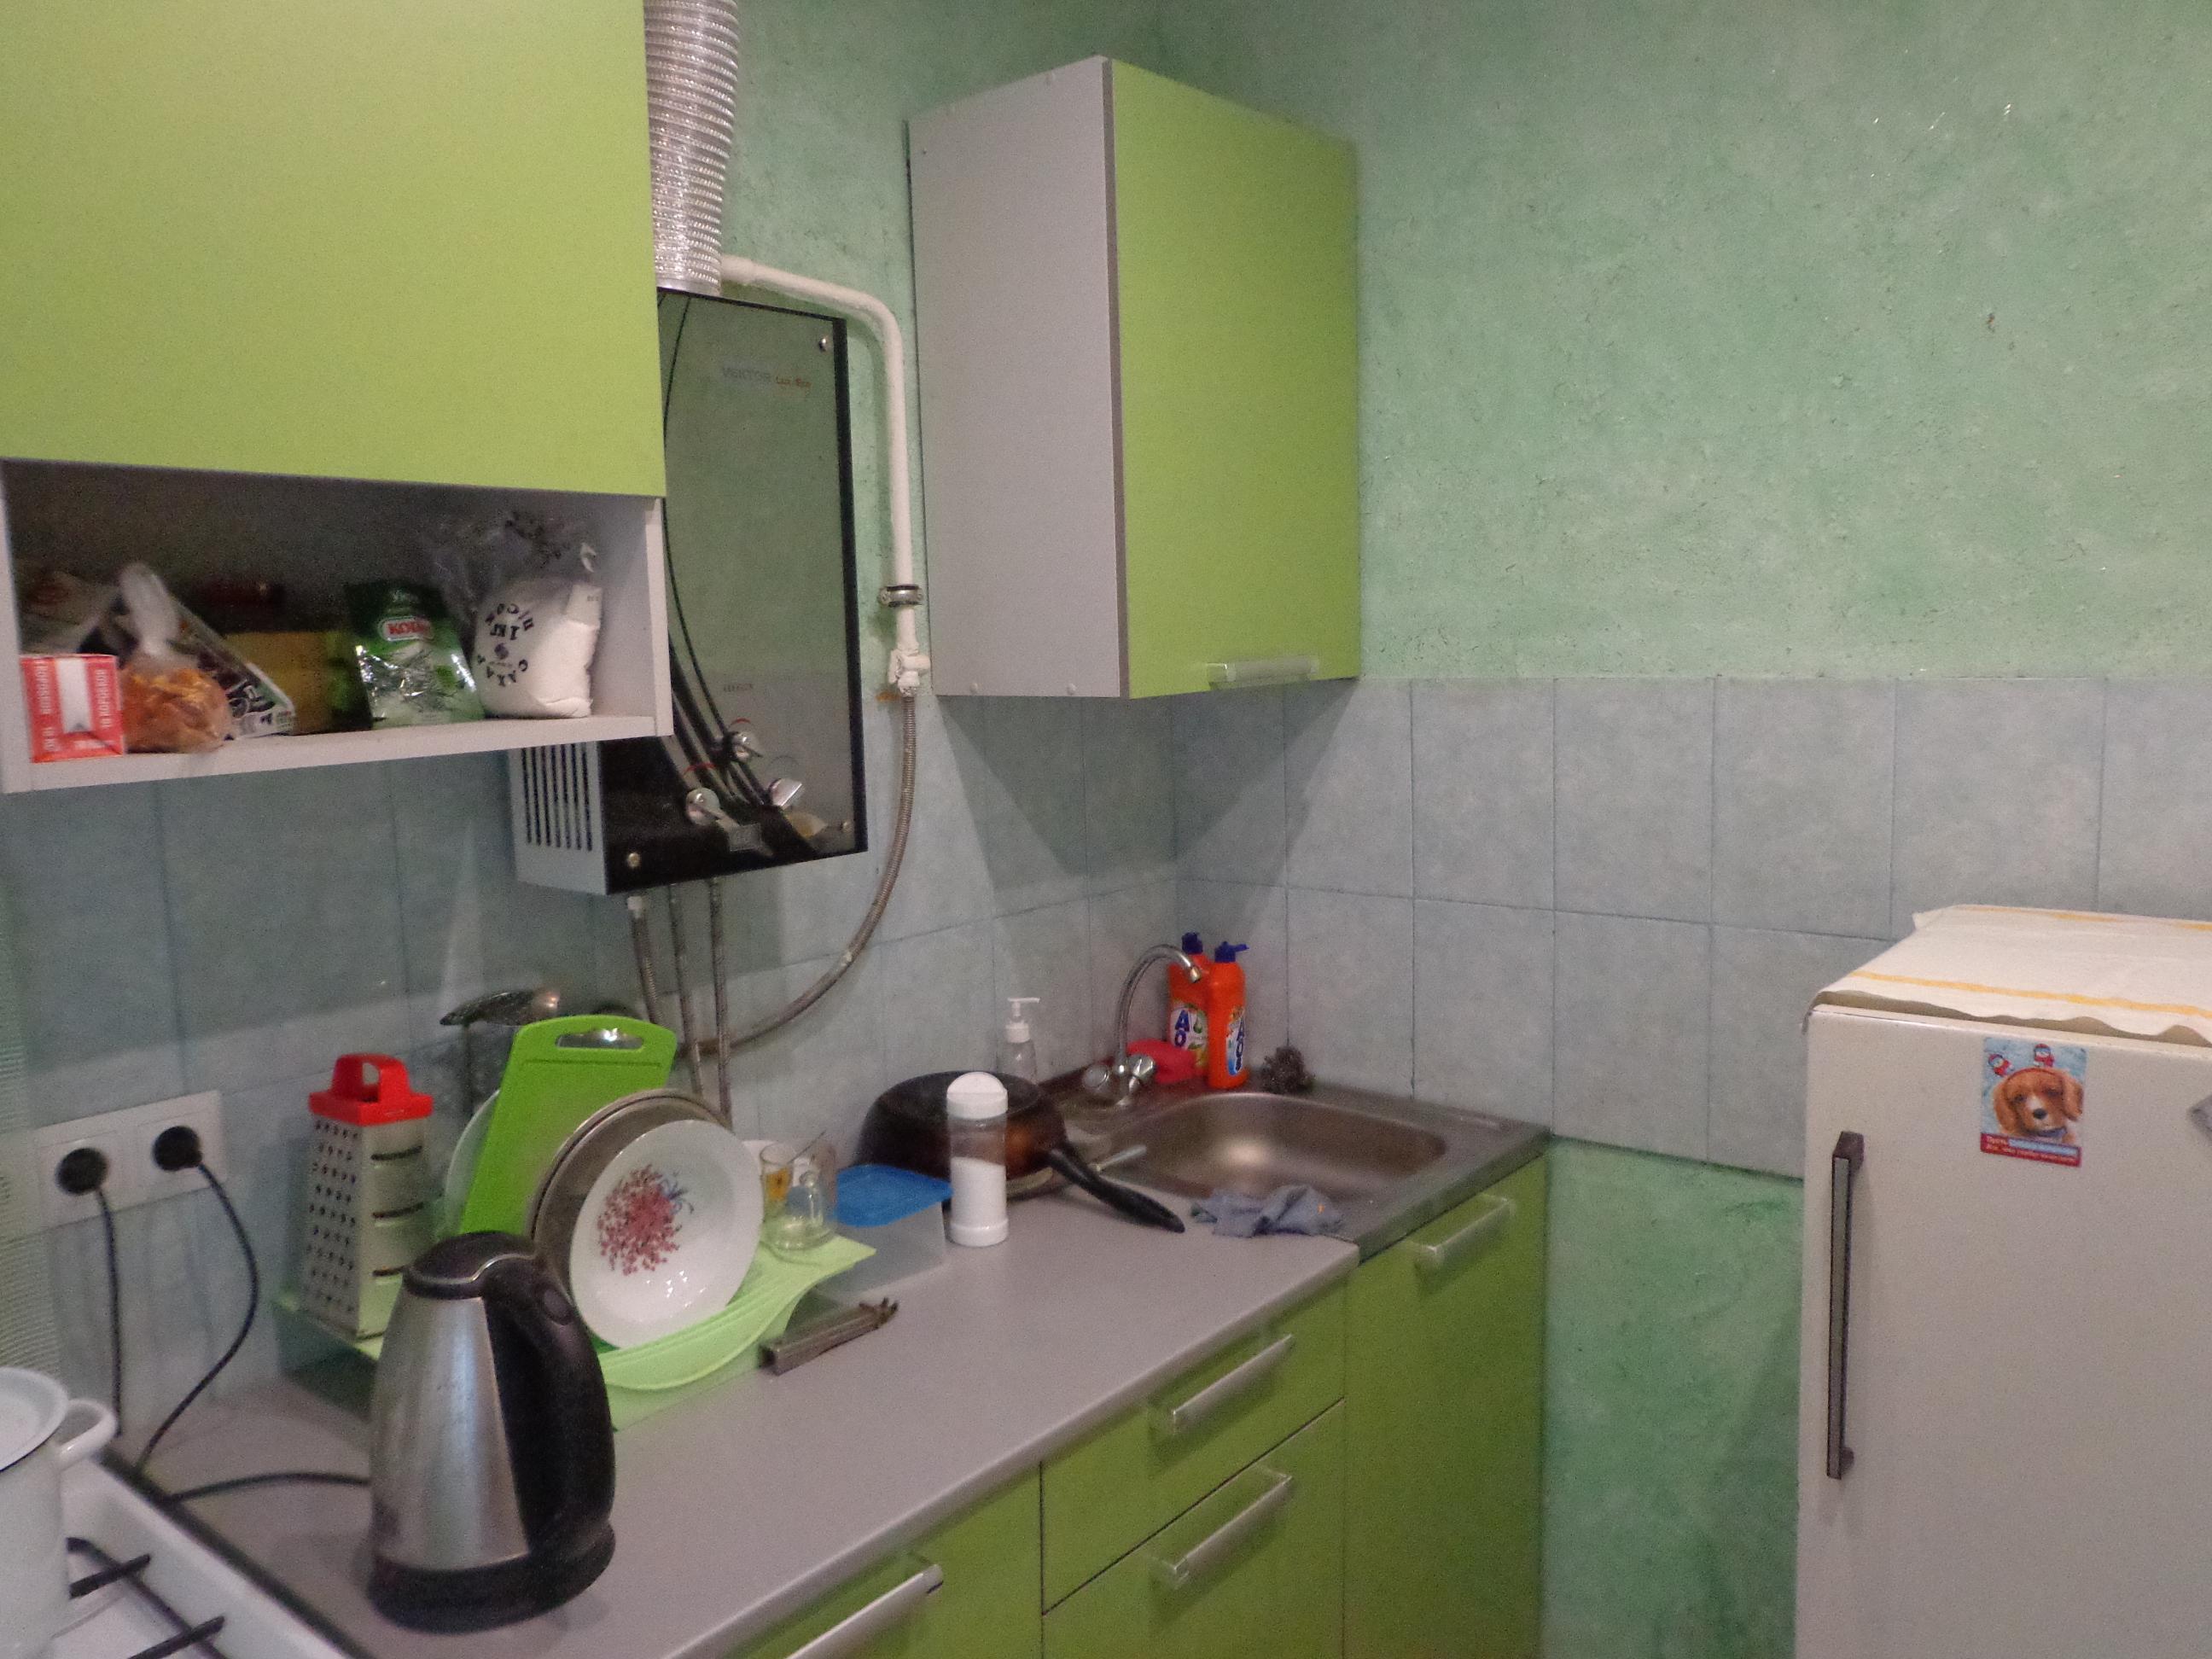 Однокомнатная квартира - ул. Бастионная, д. 25